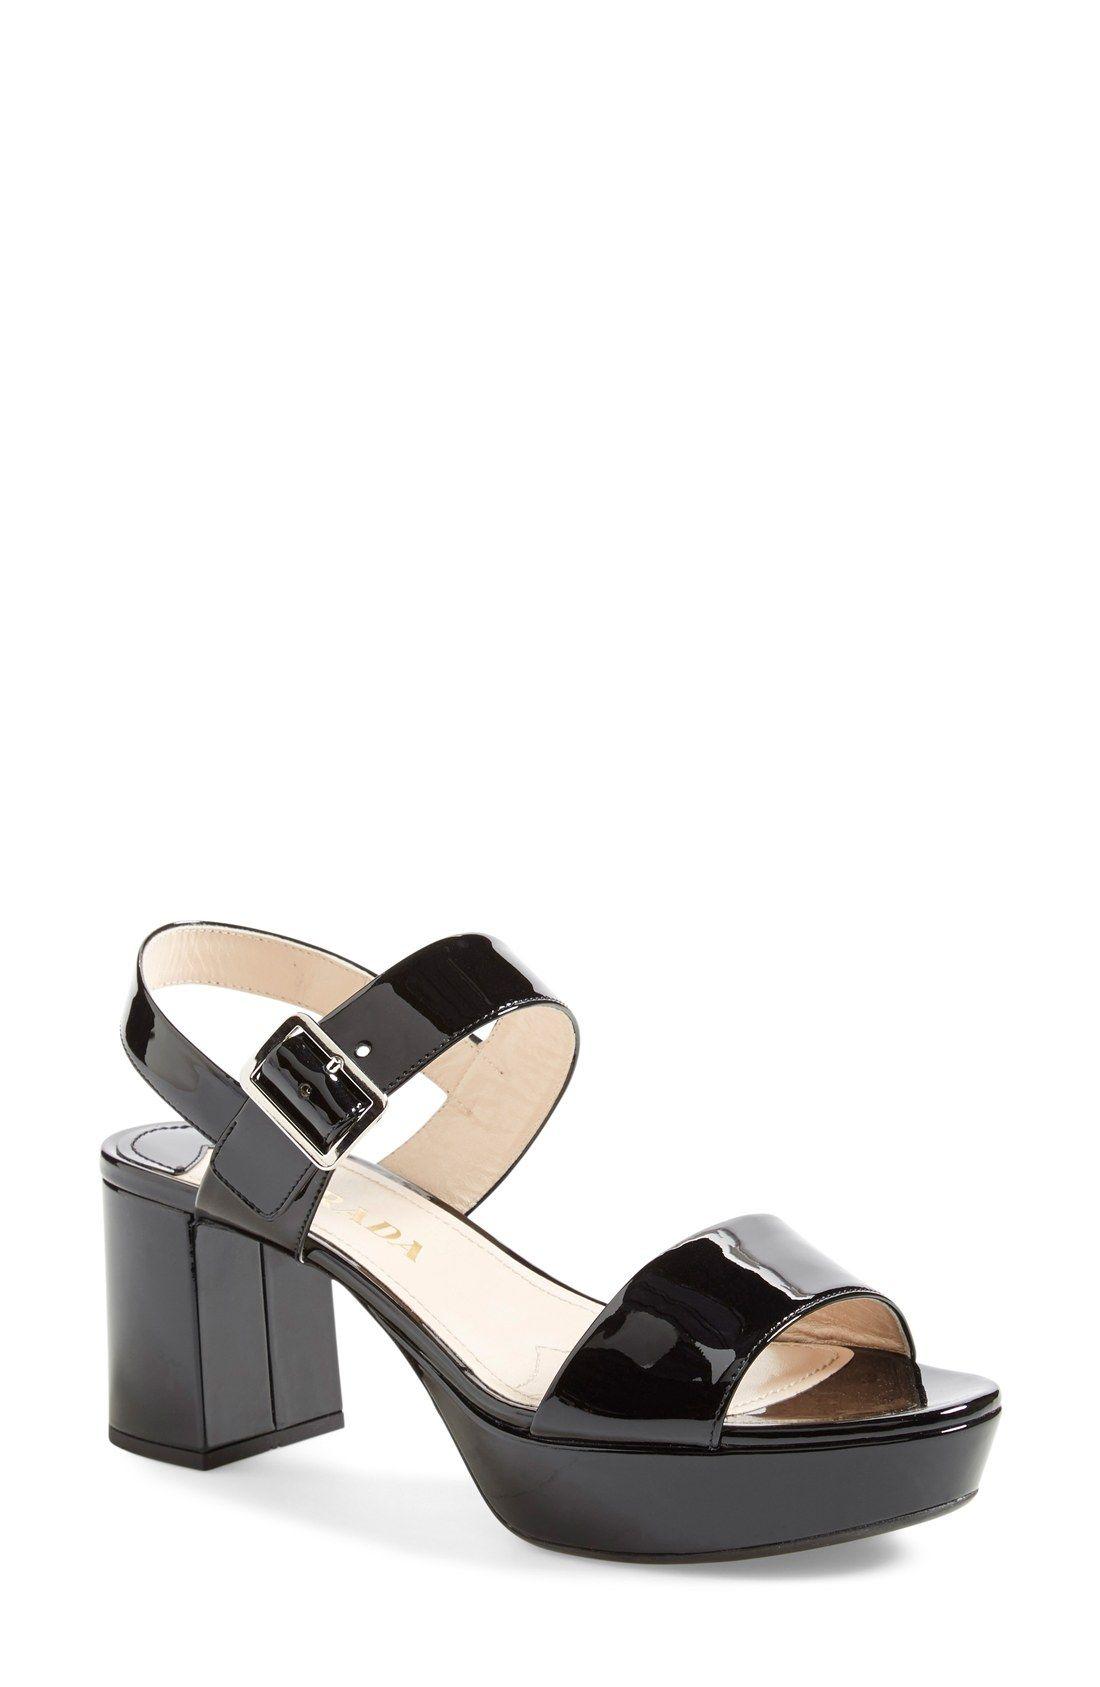 Prada Block heel sandals 3gkYdiT8